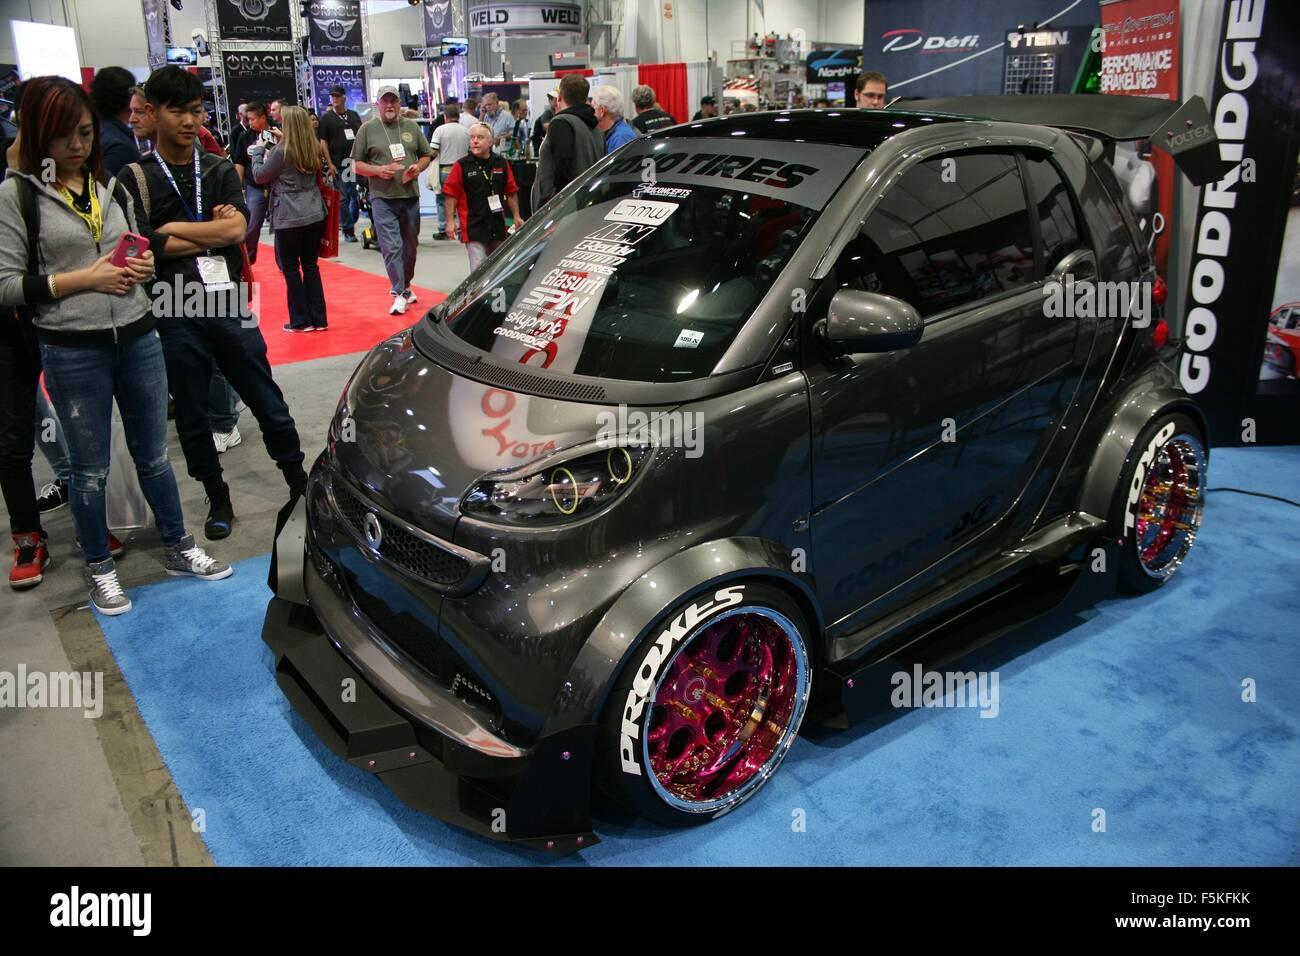 Custom Smart Car >> Las Vegas Nv Usa 5th Nov 2015 Custom Smart Car In